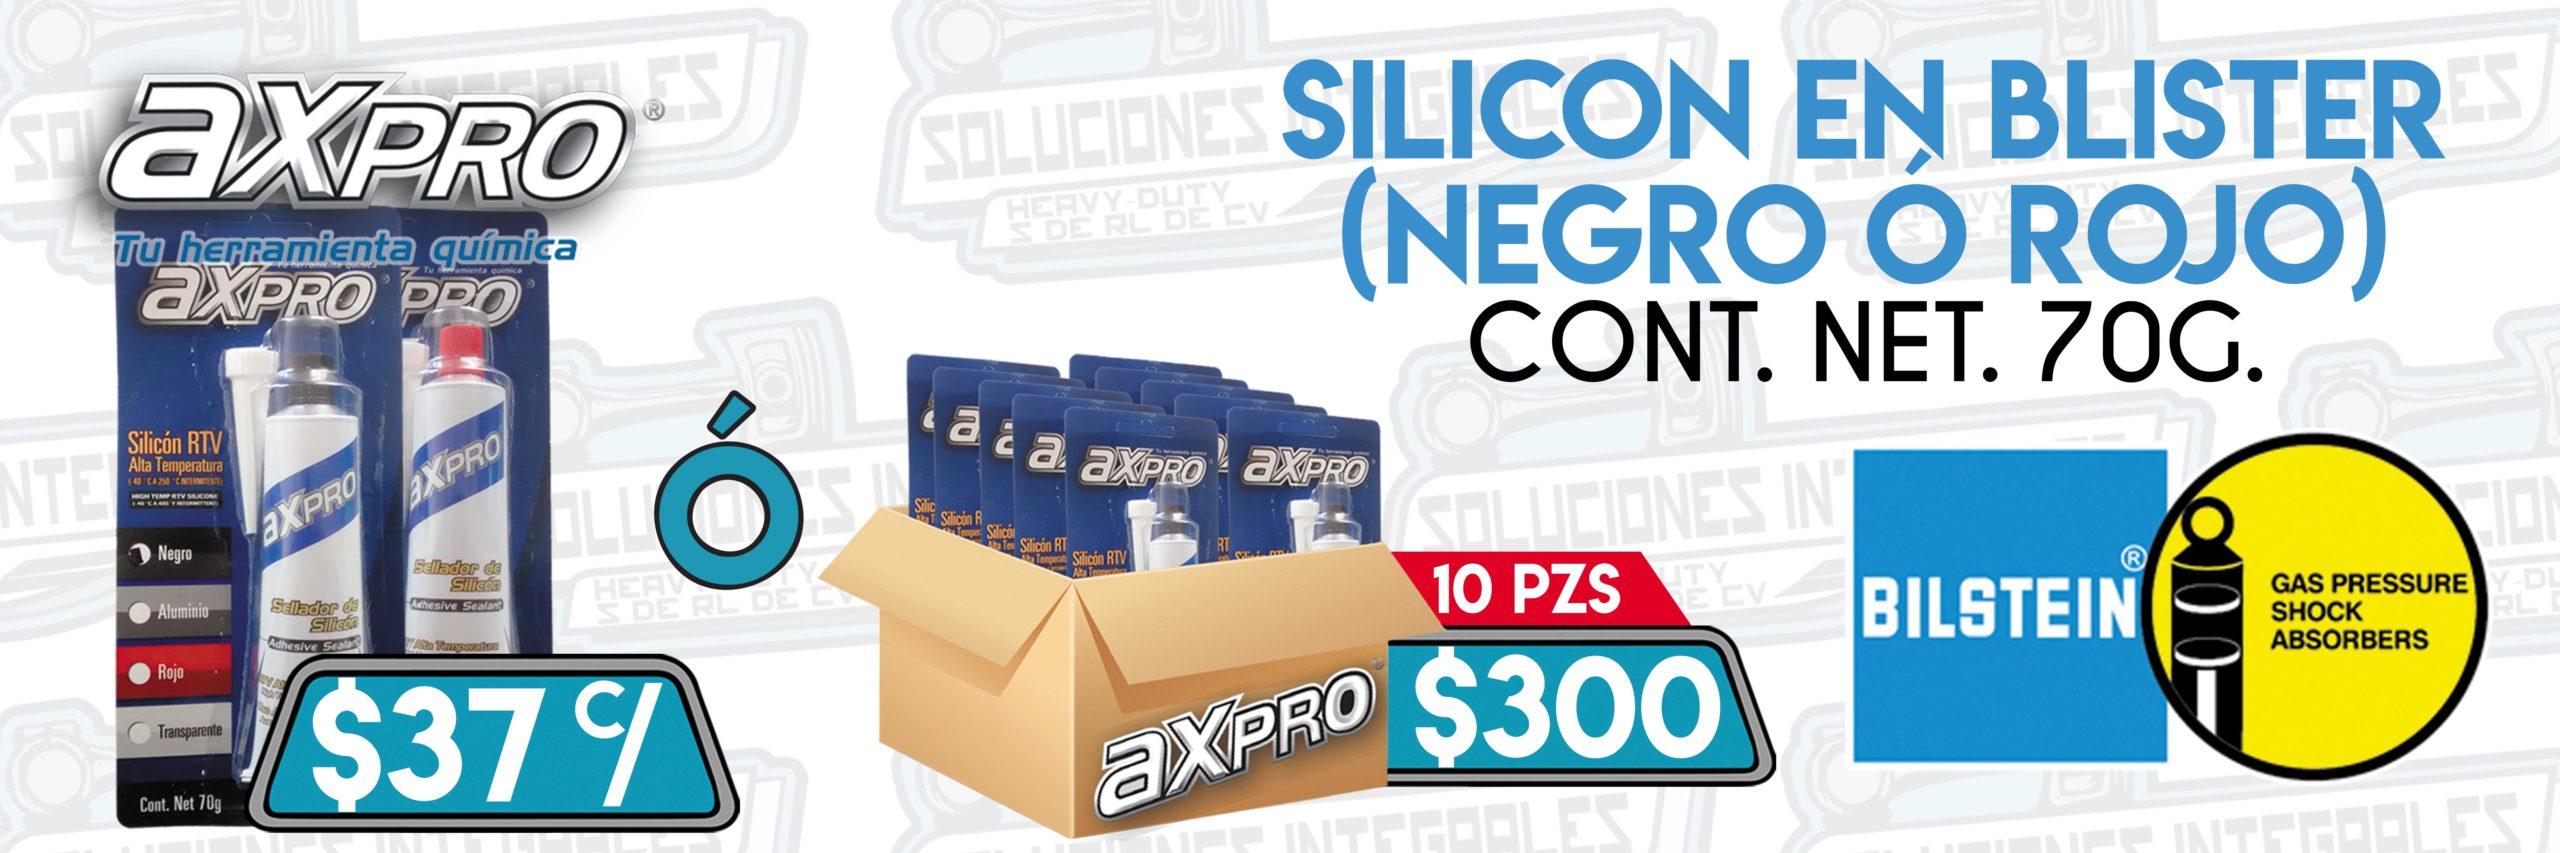 silicon oferta de 10